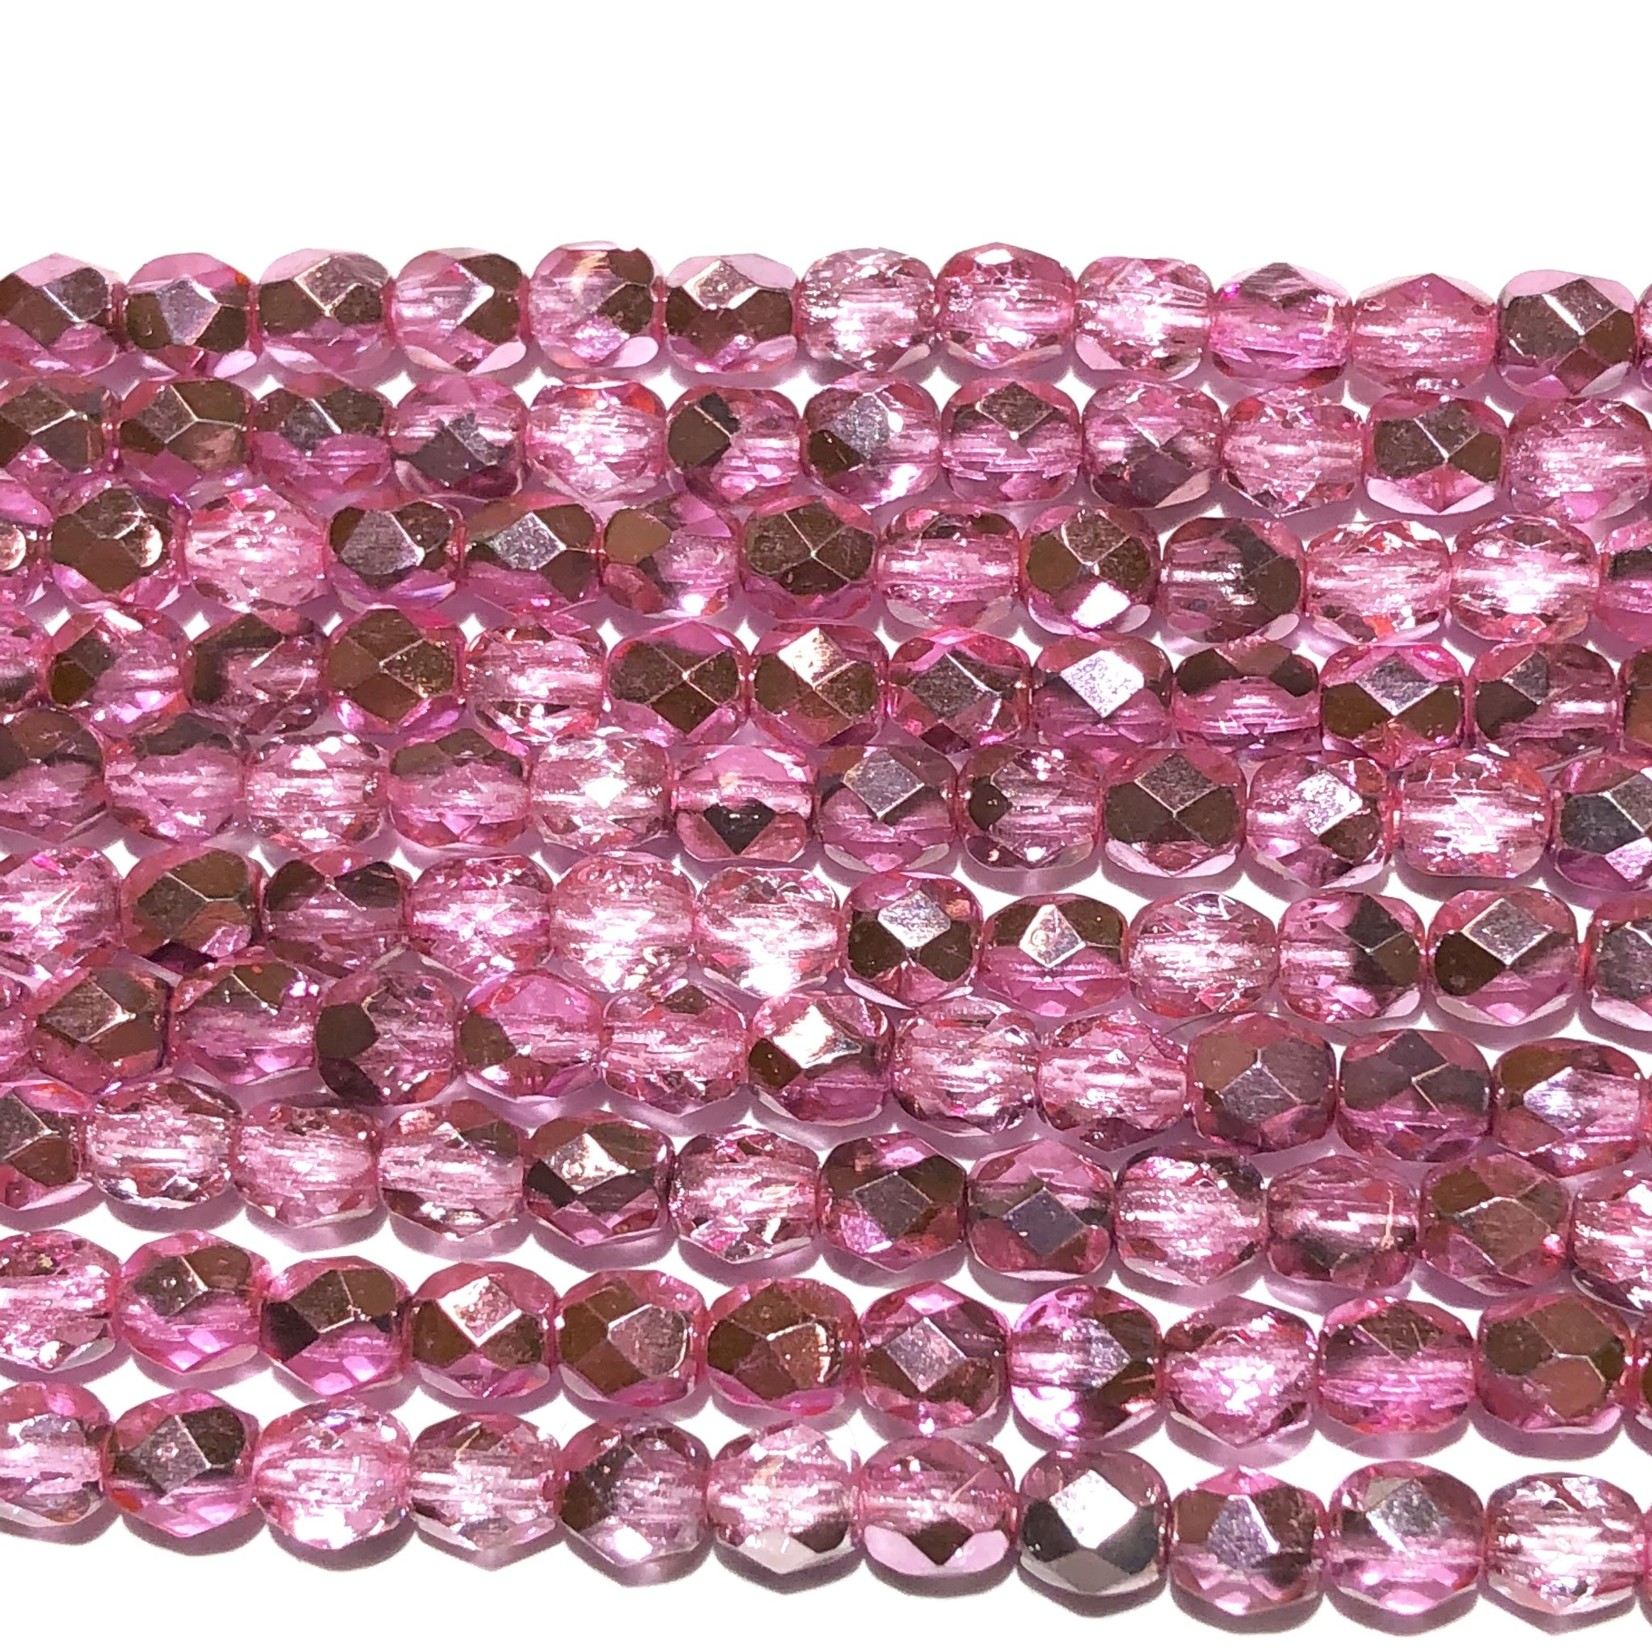 MATUBO Firepolish Metallic Crystal Hot Pink 4mm